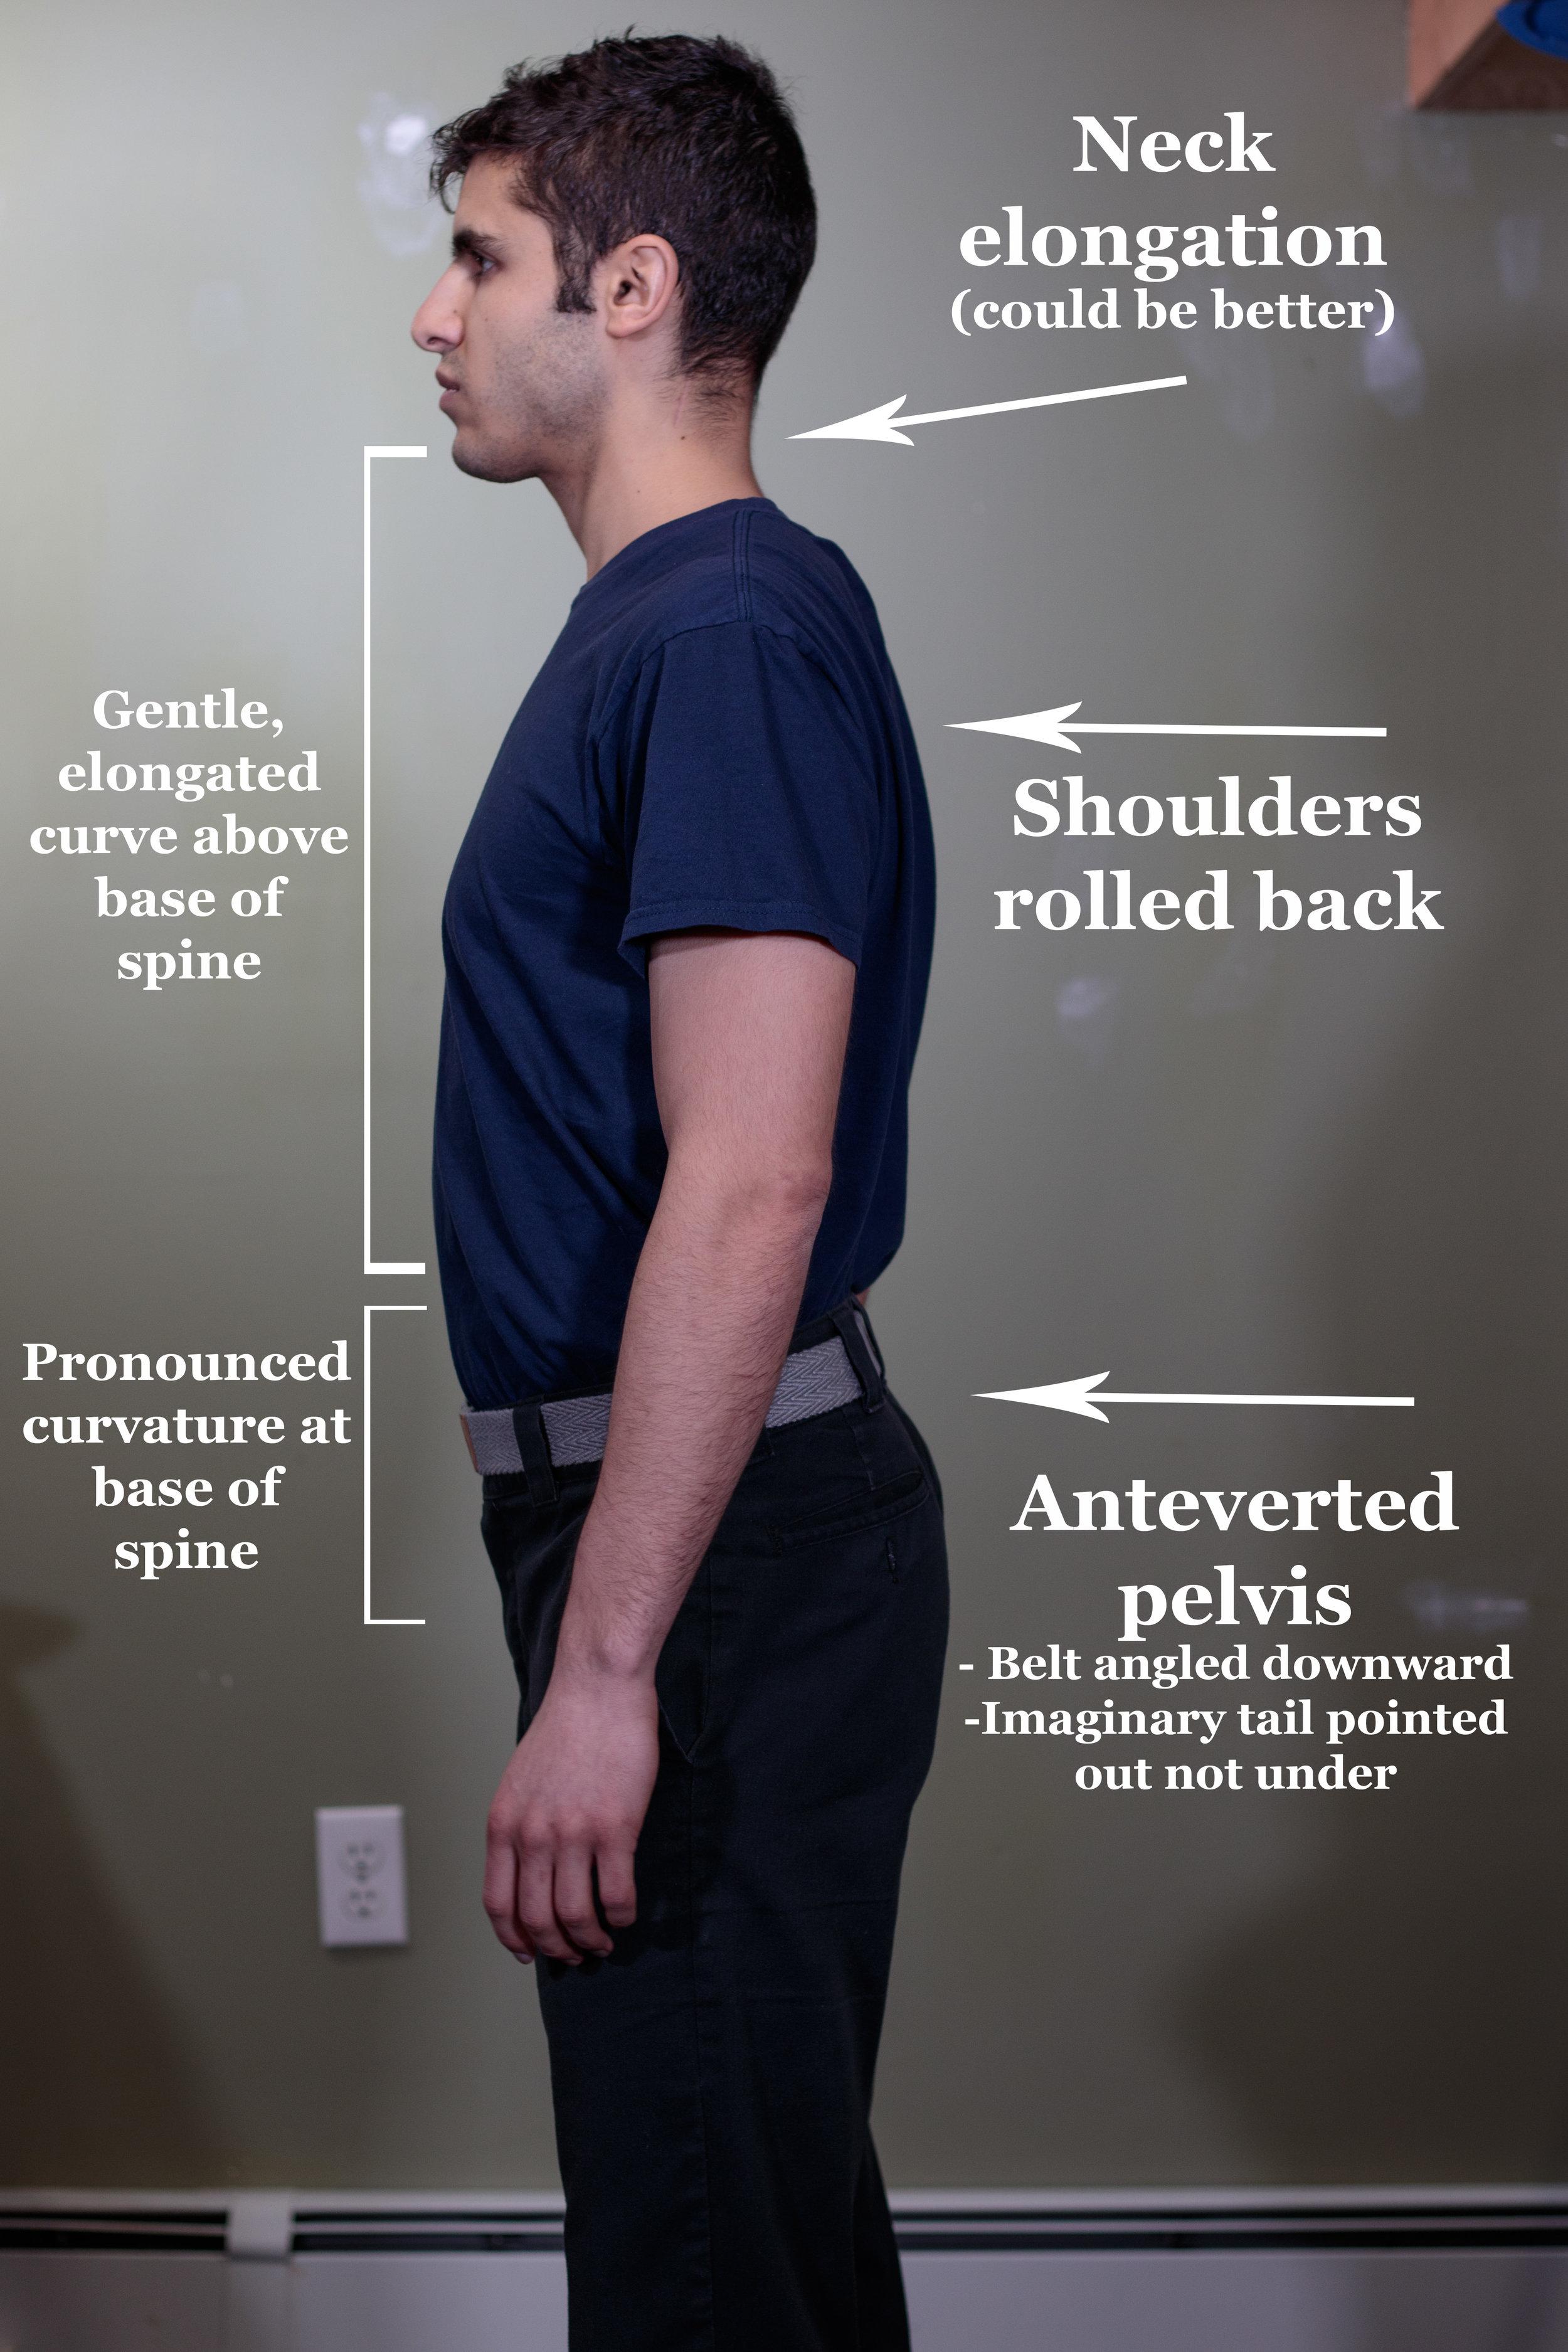 Primal Posture Side View